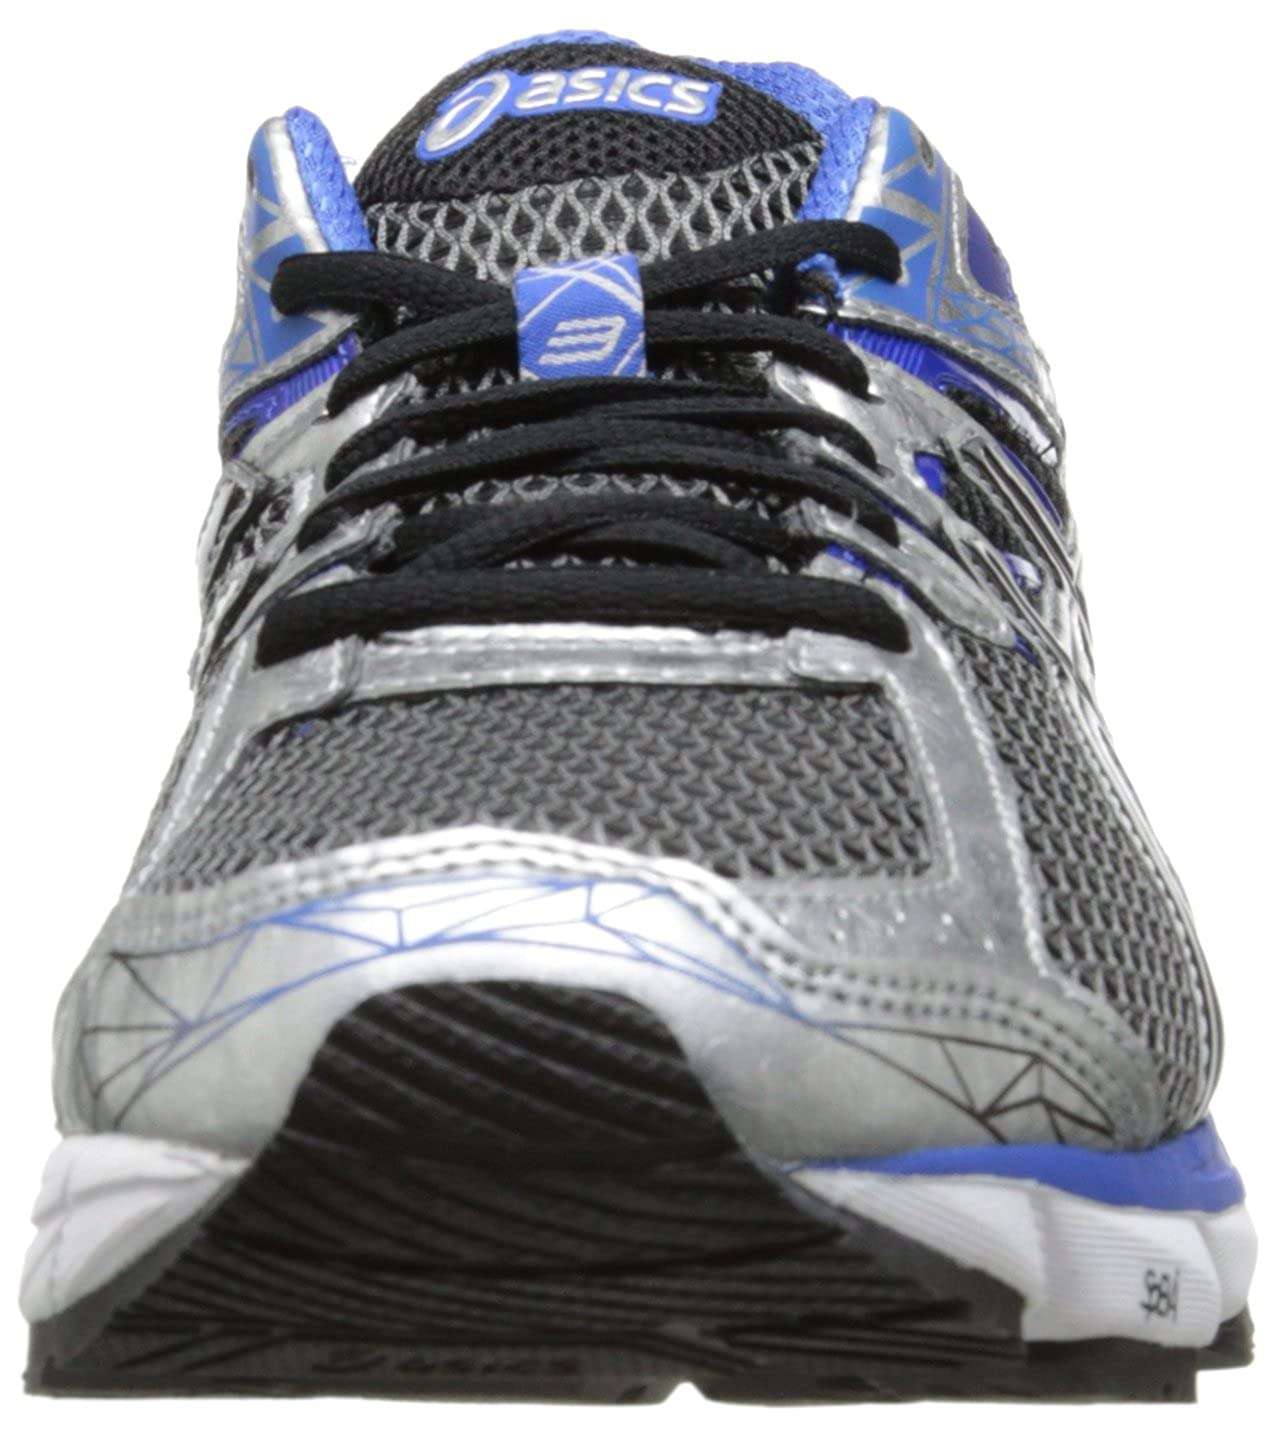 ASICS Men's GT 1000 3 Synthetic Running Shoe